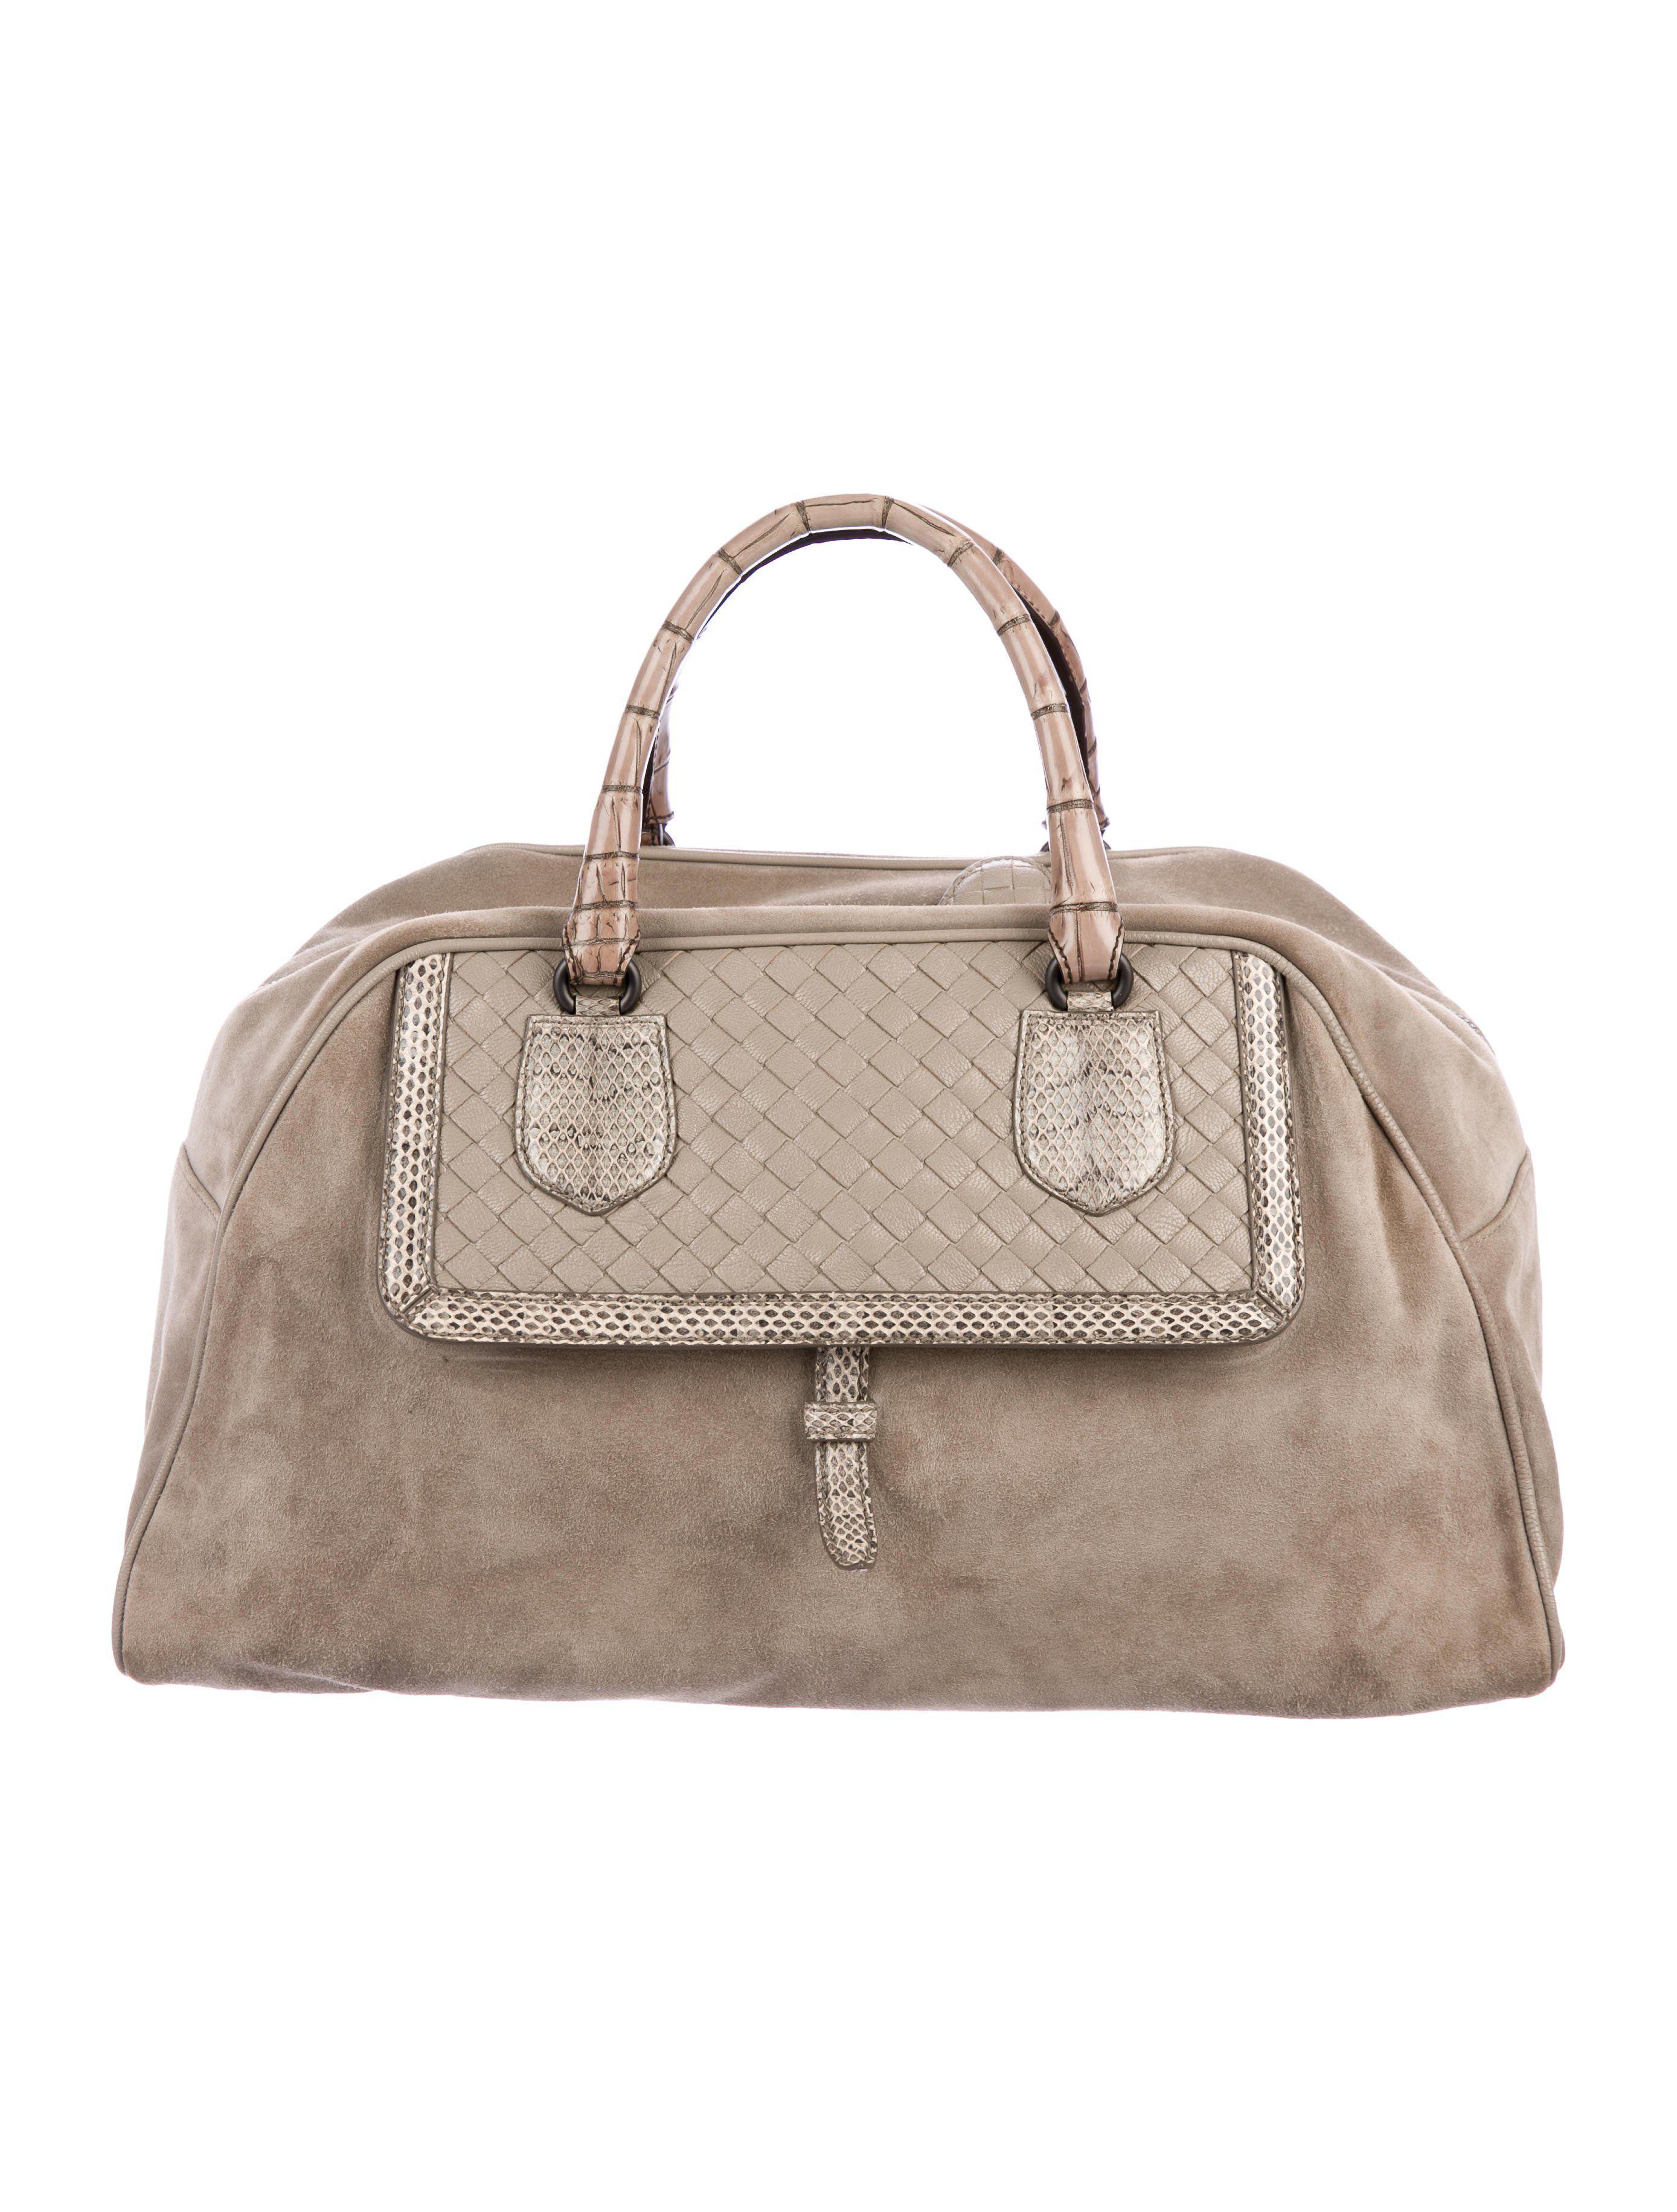 7a0491e2d9 Light taupe suede Bottega Veneta bowler bag with gunmetal hardware ...